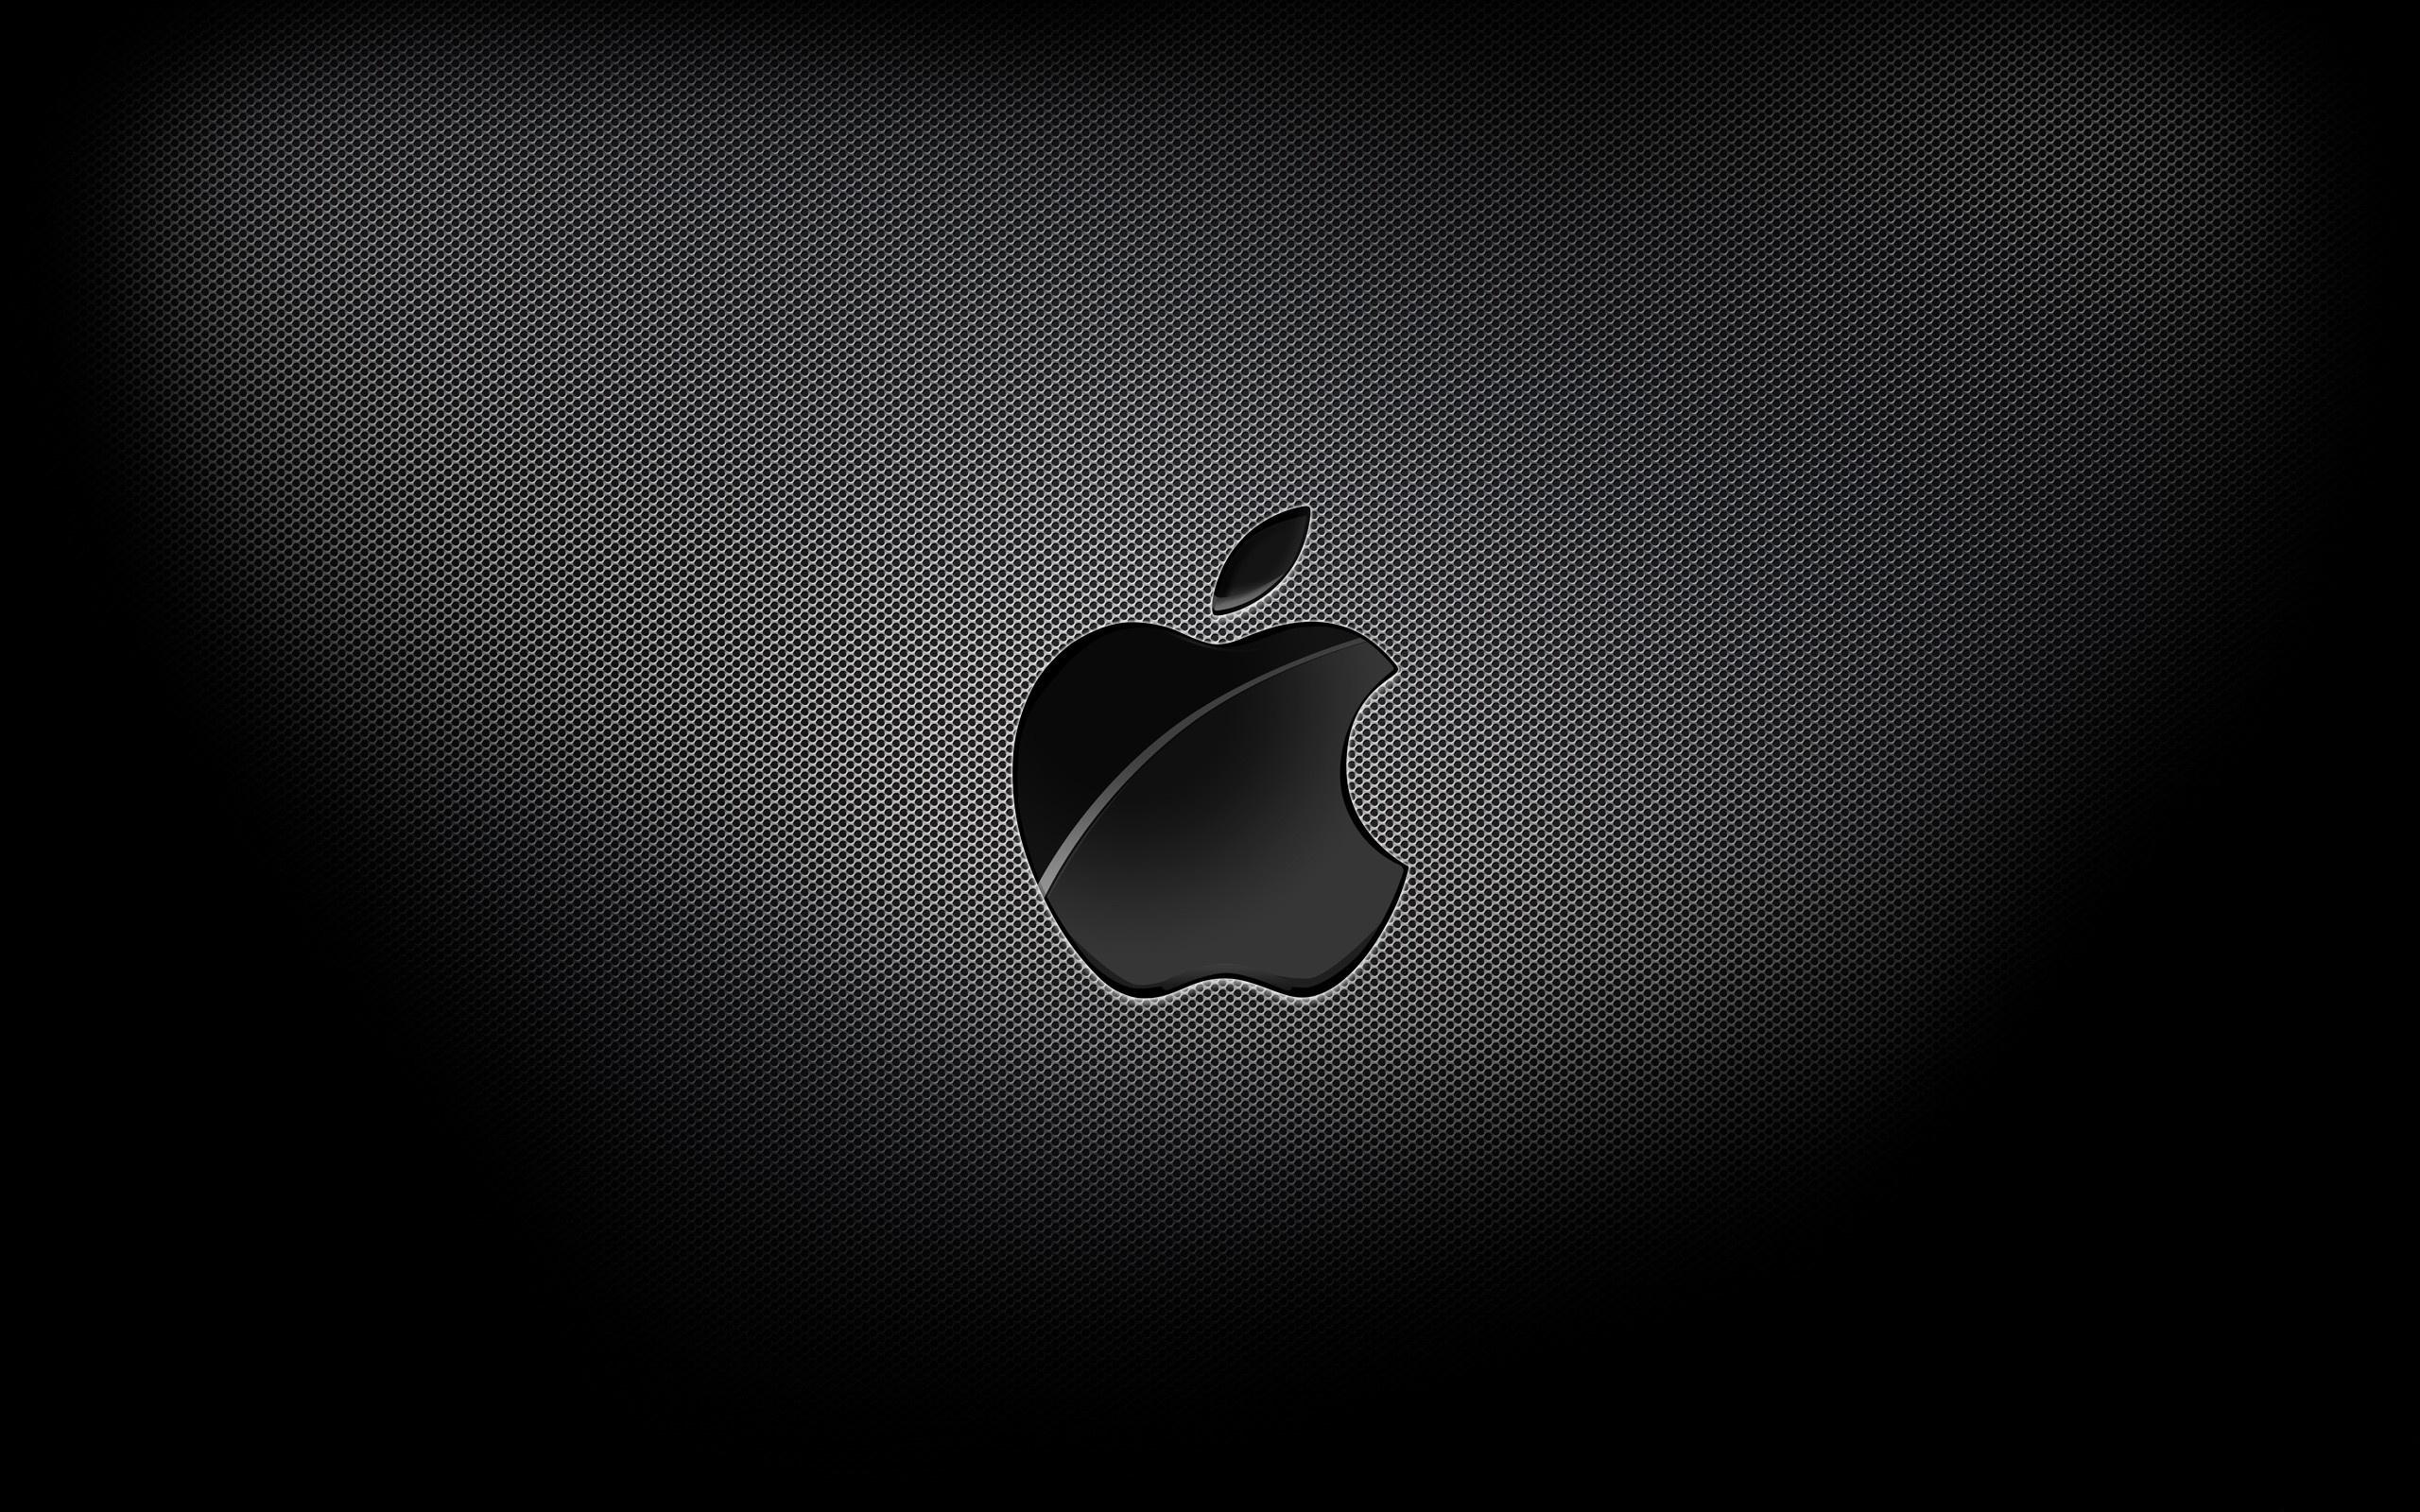 ... Black Background Mac Wallpaper Download   Free Mac Wallpapers Download